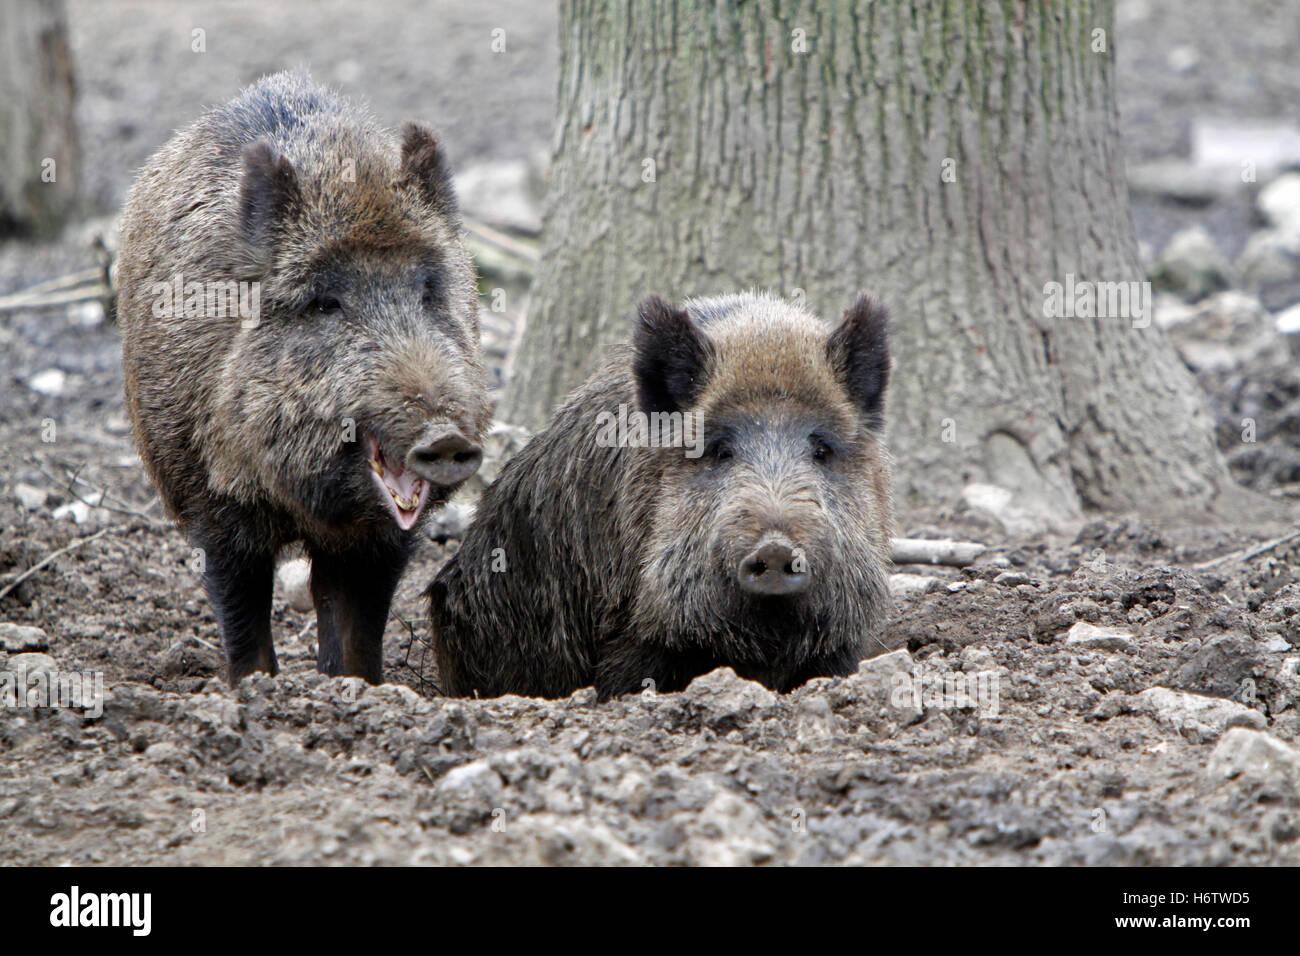 mammal wild wild boar pig wild animal wild boars mammal wild dirt mud wild boar pig brooks wild animal wild boars - Stock Image